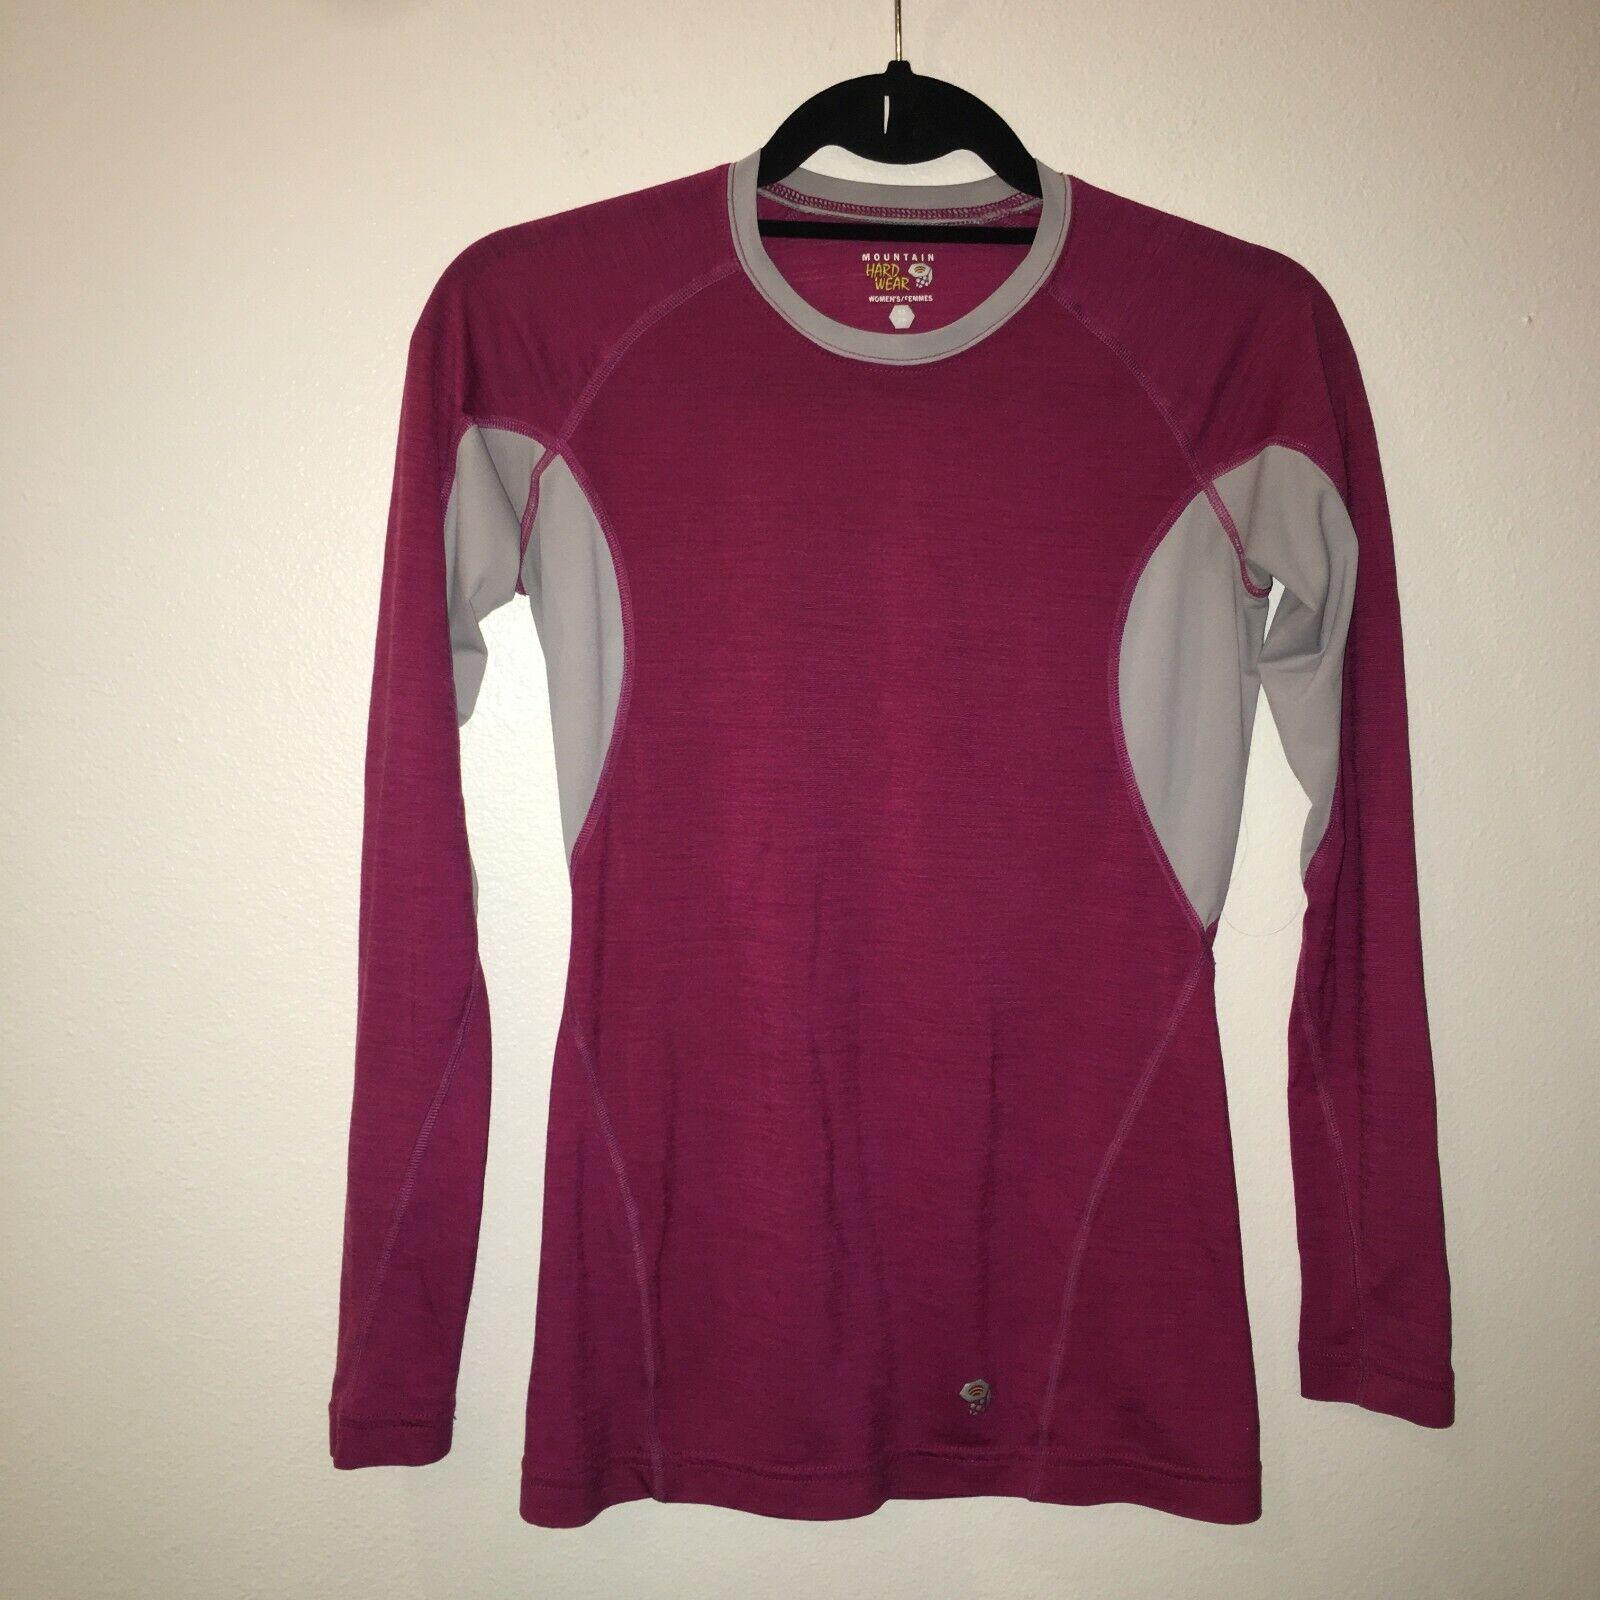 Merino women's mountain hardwear xs longsleeve lightweight shirt 21-1958